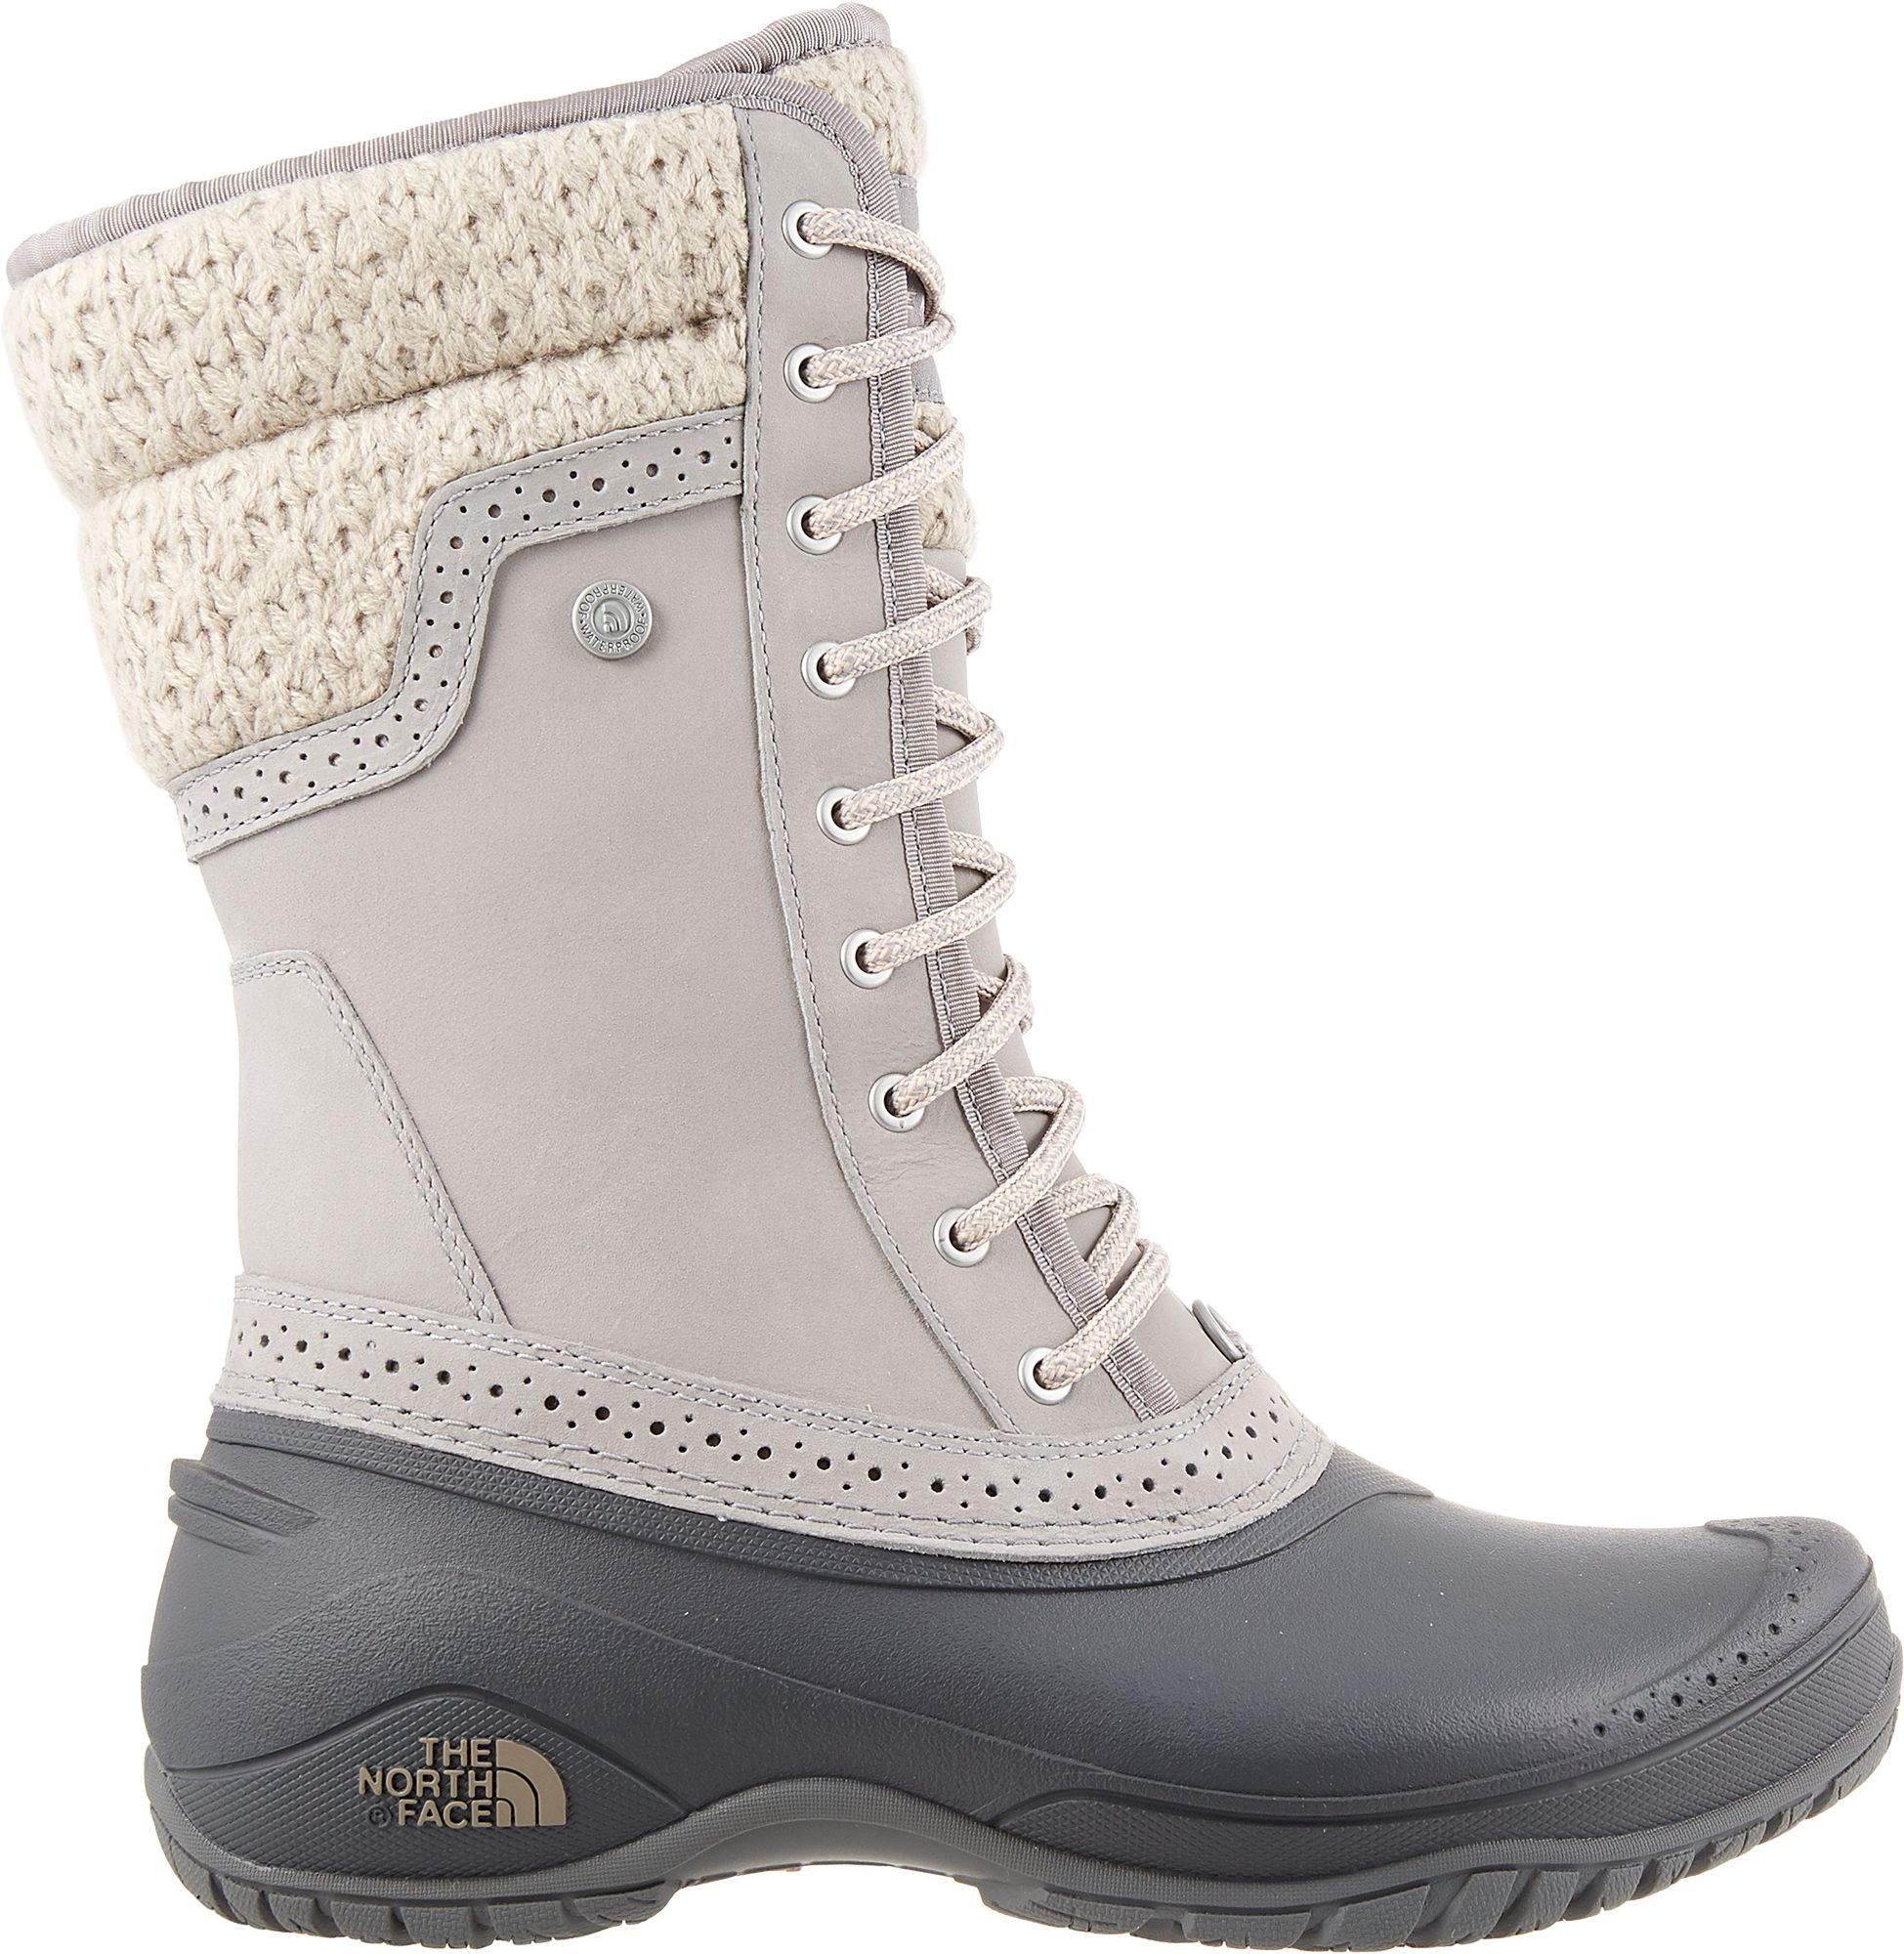 5efc821b2379 The North Face Women s Shellista II Mid 200g Waterproof Winter Boots ...